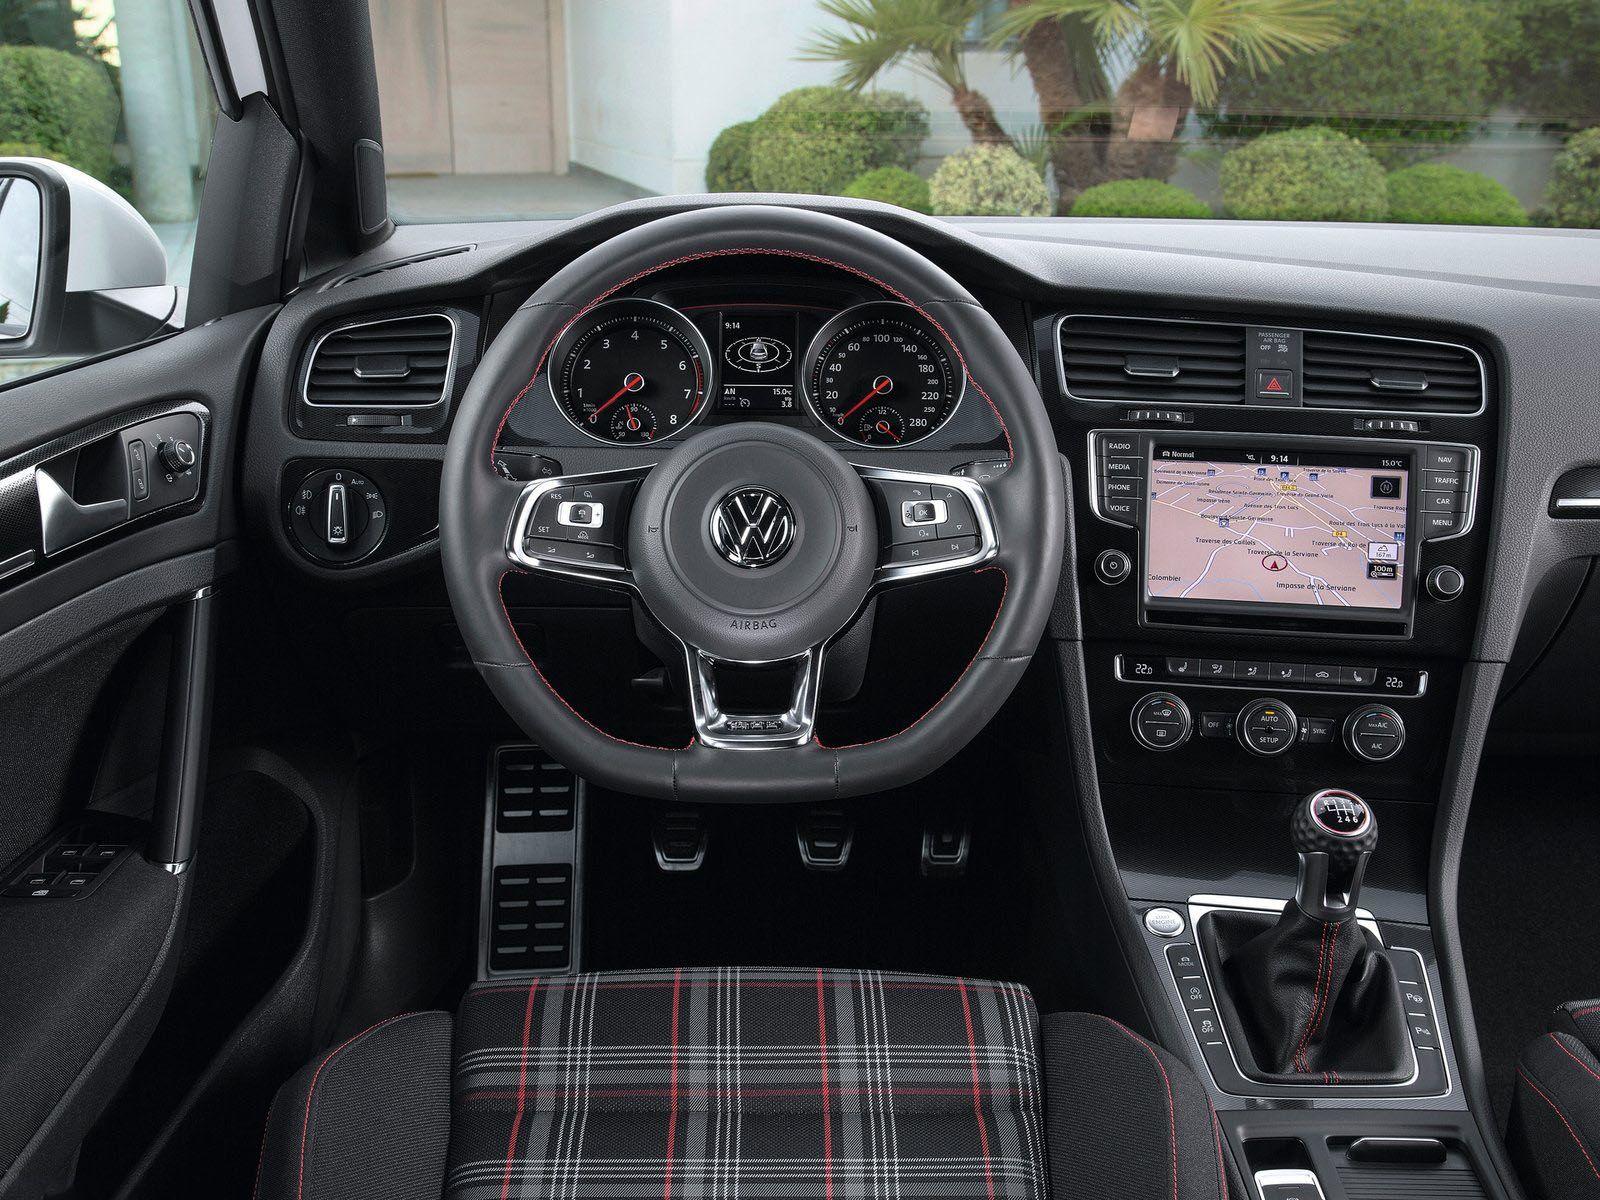 Carro Novo Volkswagen Golf Gti 2014 Golf Gti Volkswagen Golf